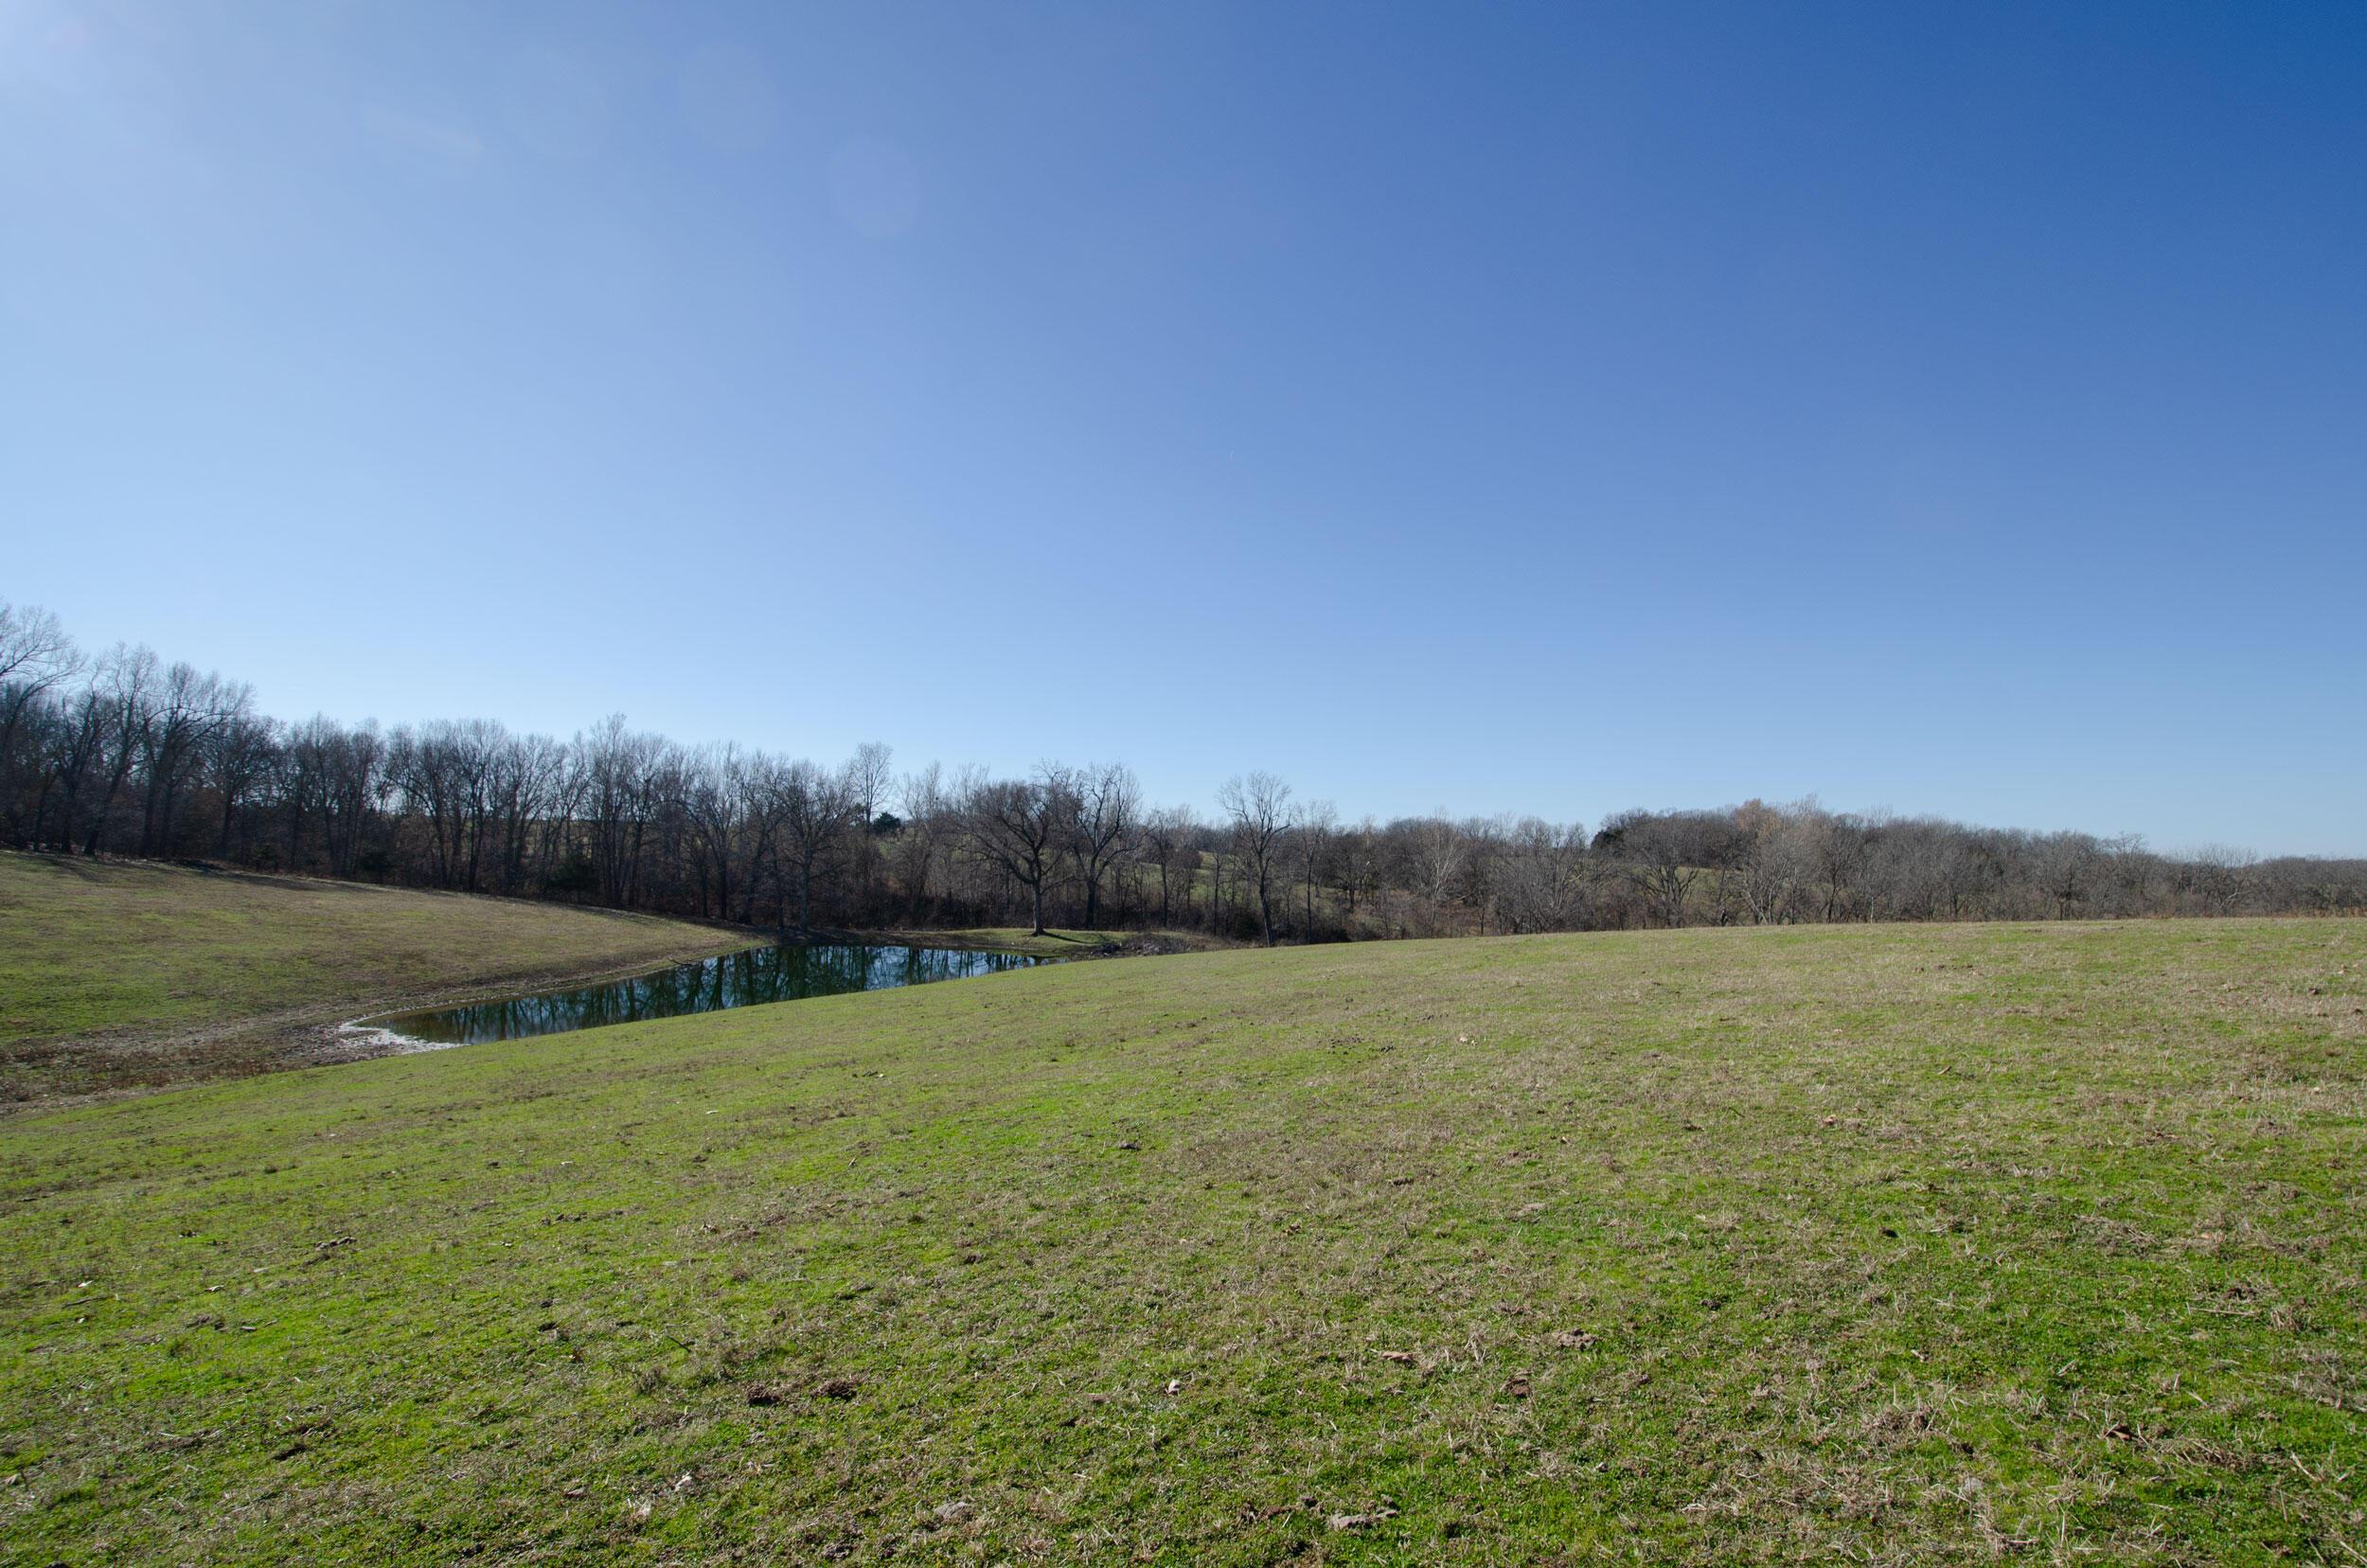 000 Ac Springer Farm Hwy Crane, MO 65633